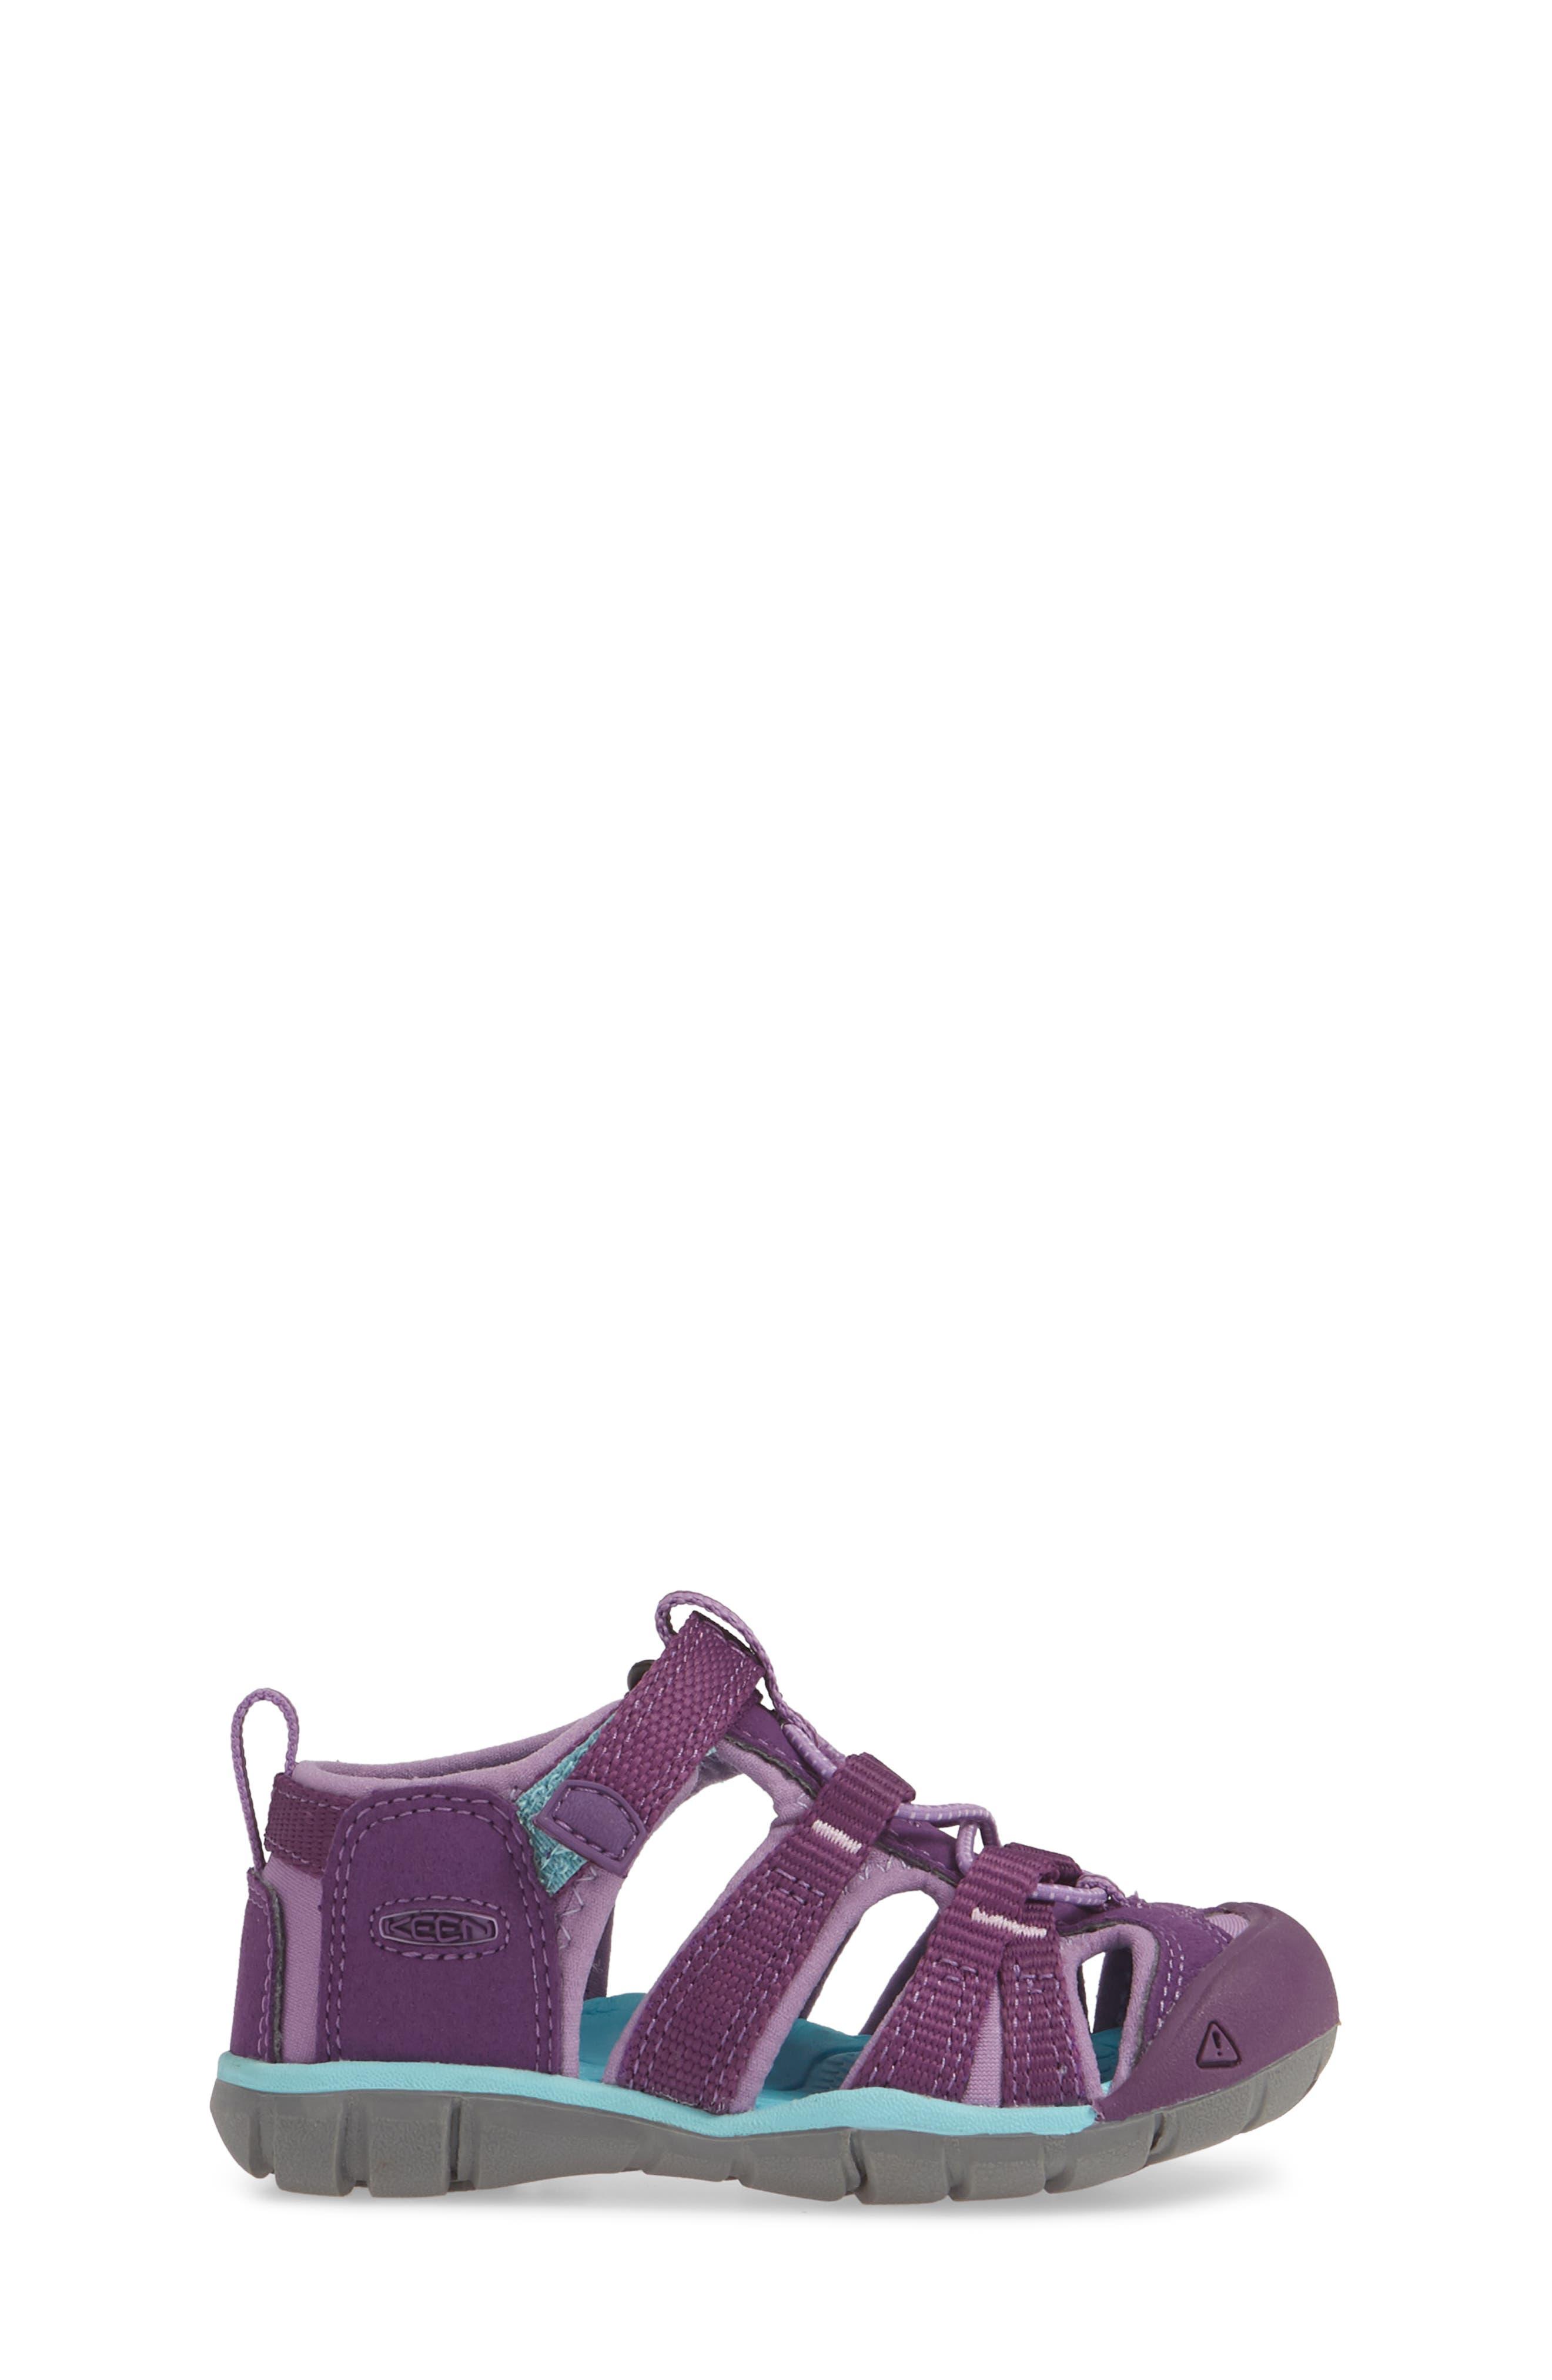 ,                             'Seacamp II' Water Friendly Sandal,                             Alternate thumbnail 60, color,                             509